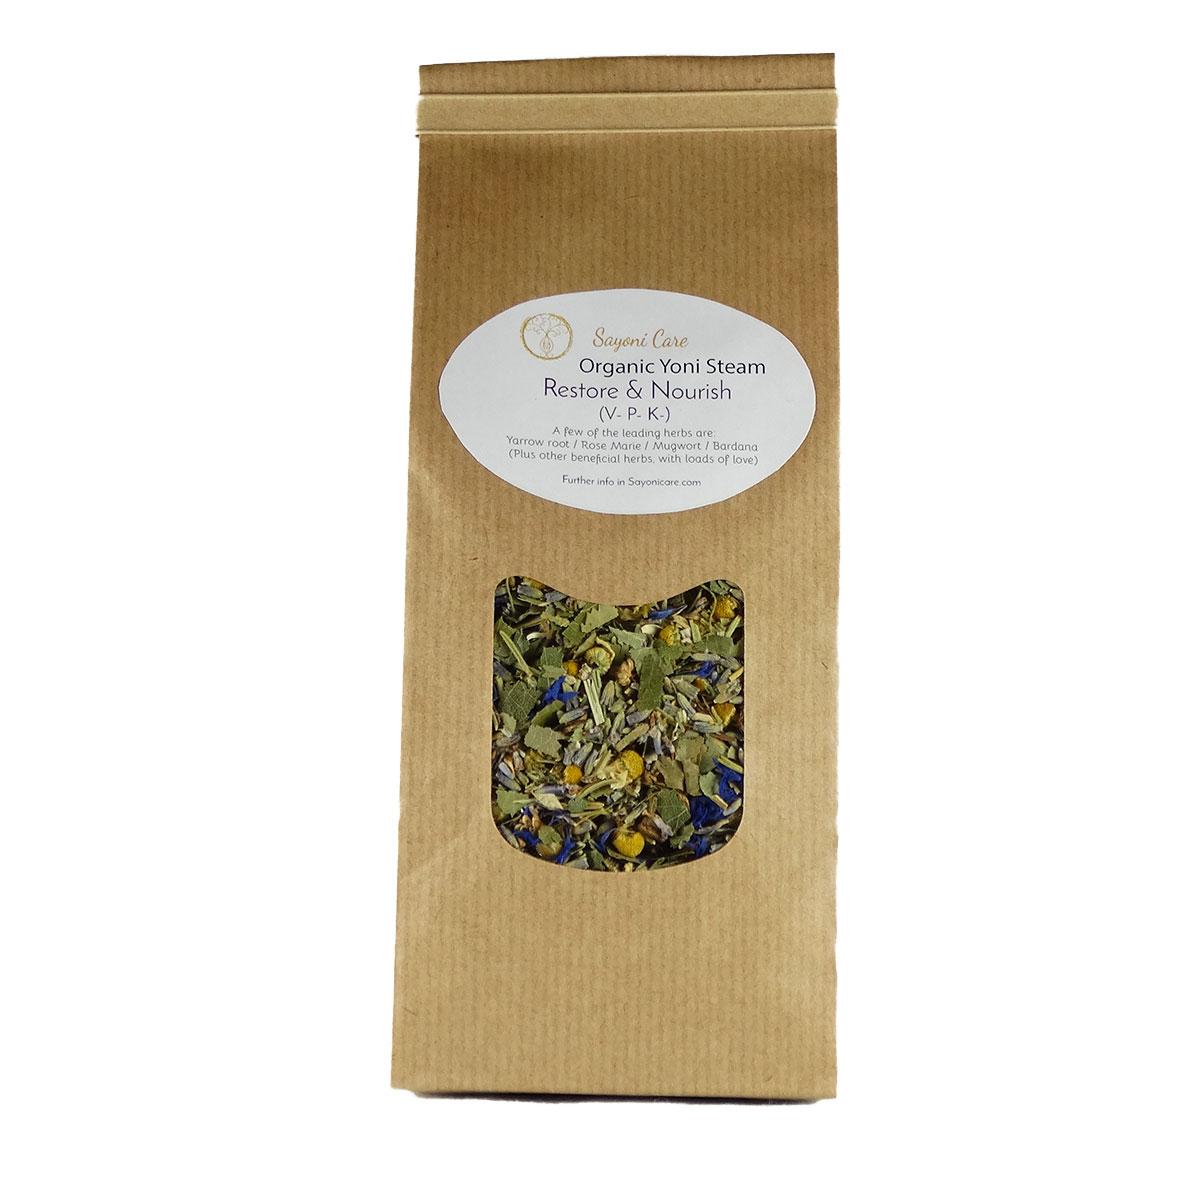 Restore & Nourish organic herbal vaginal steam - Sayoni Care